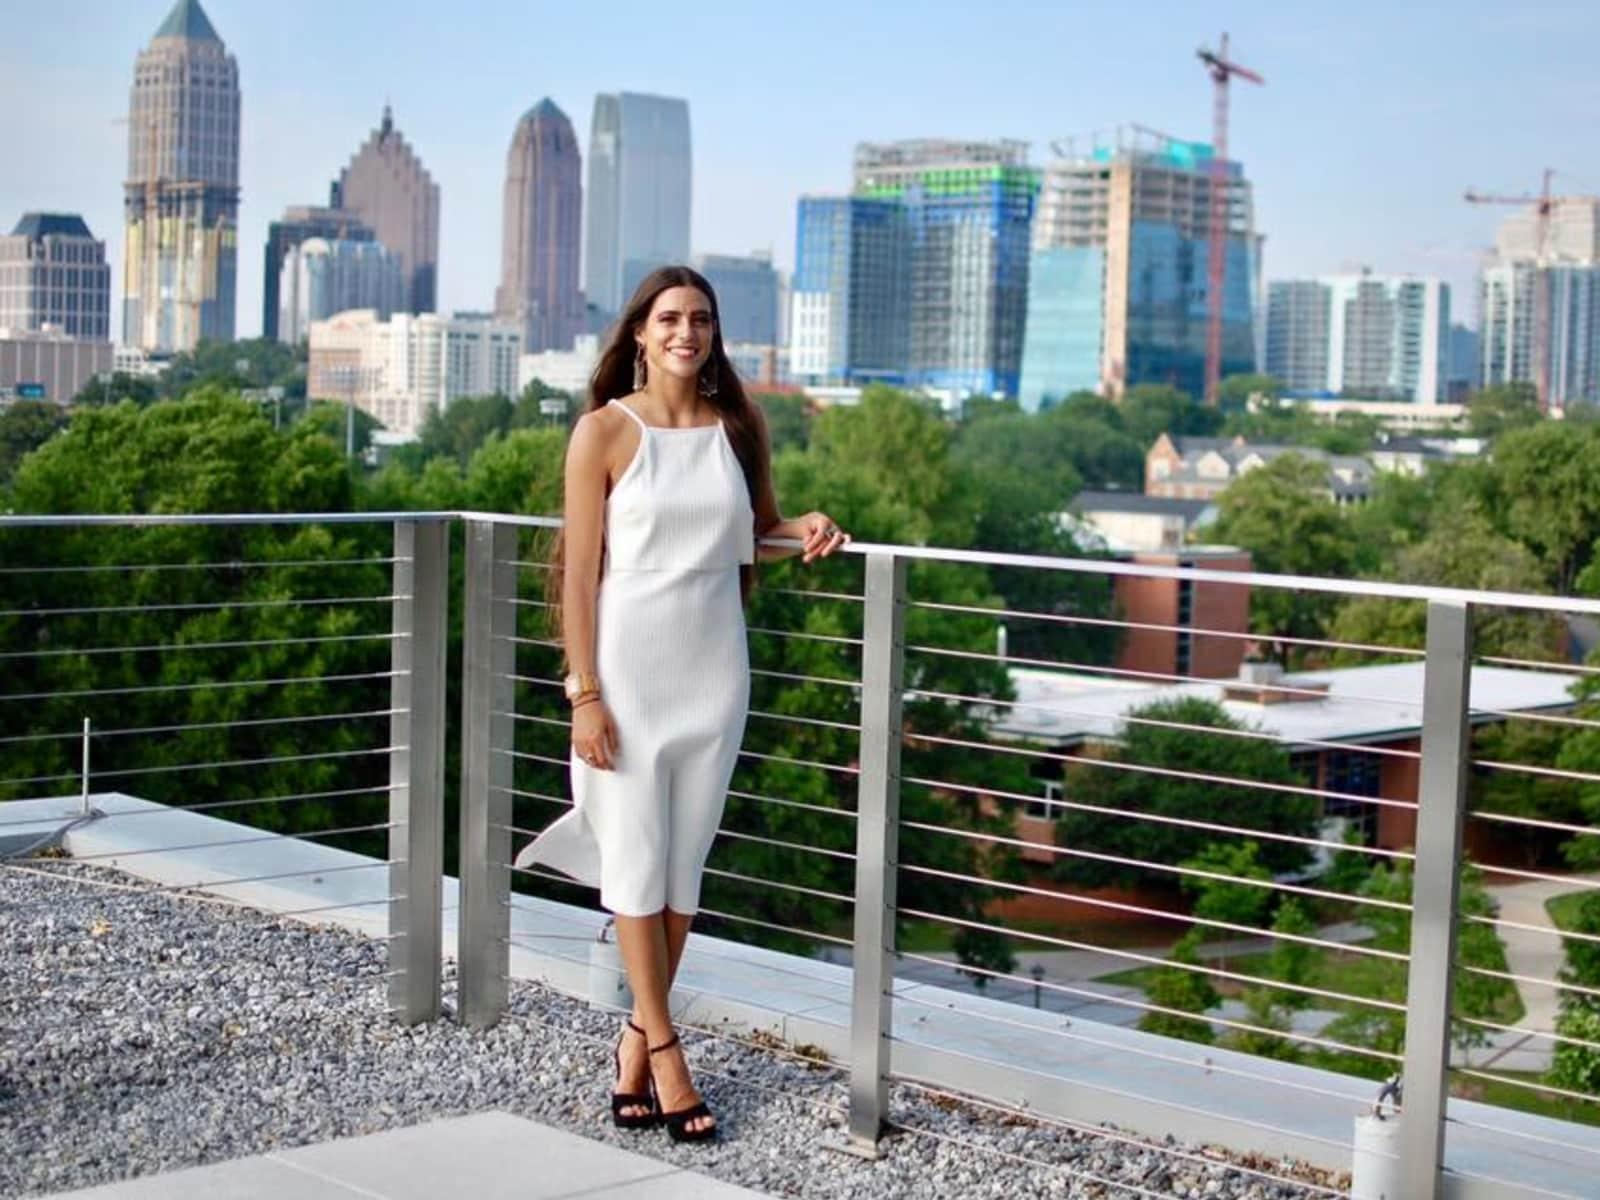 Rebecca from Atlanta, Georgia, United States